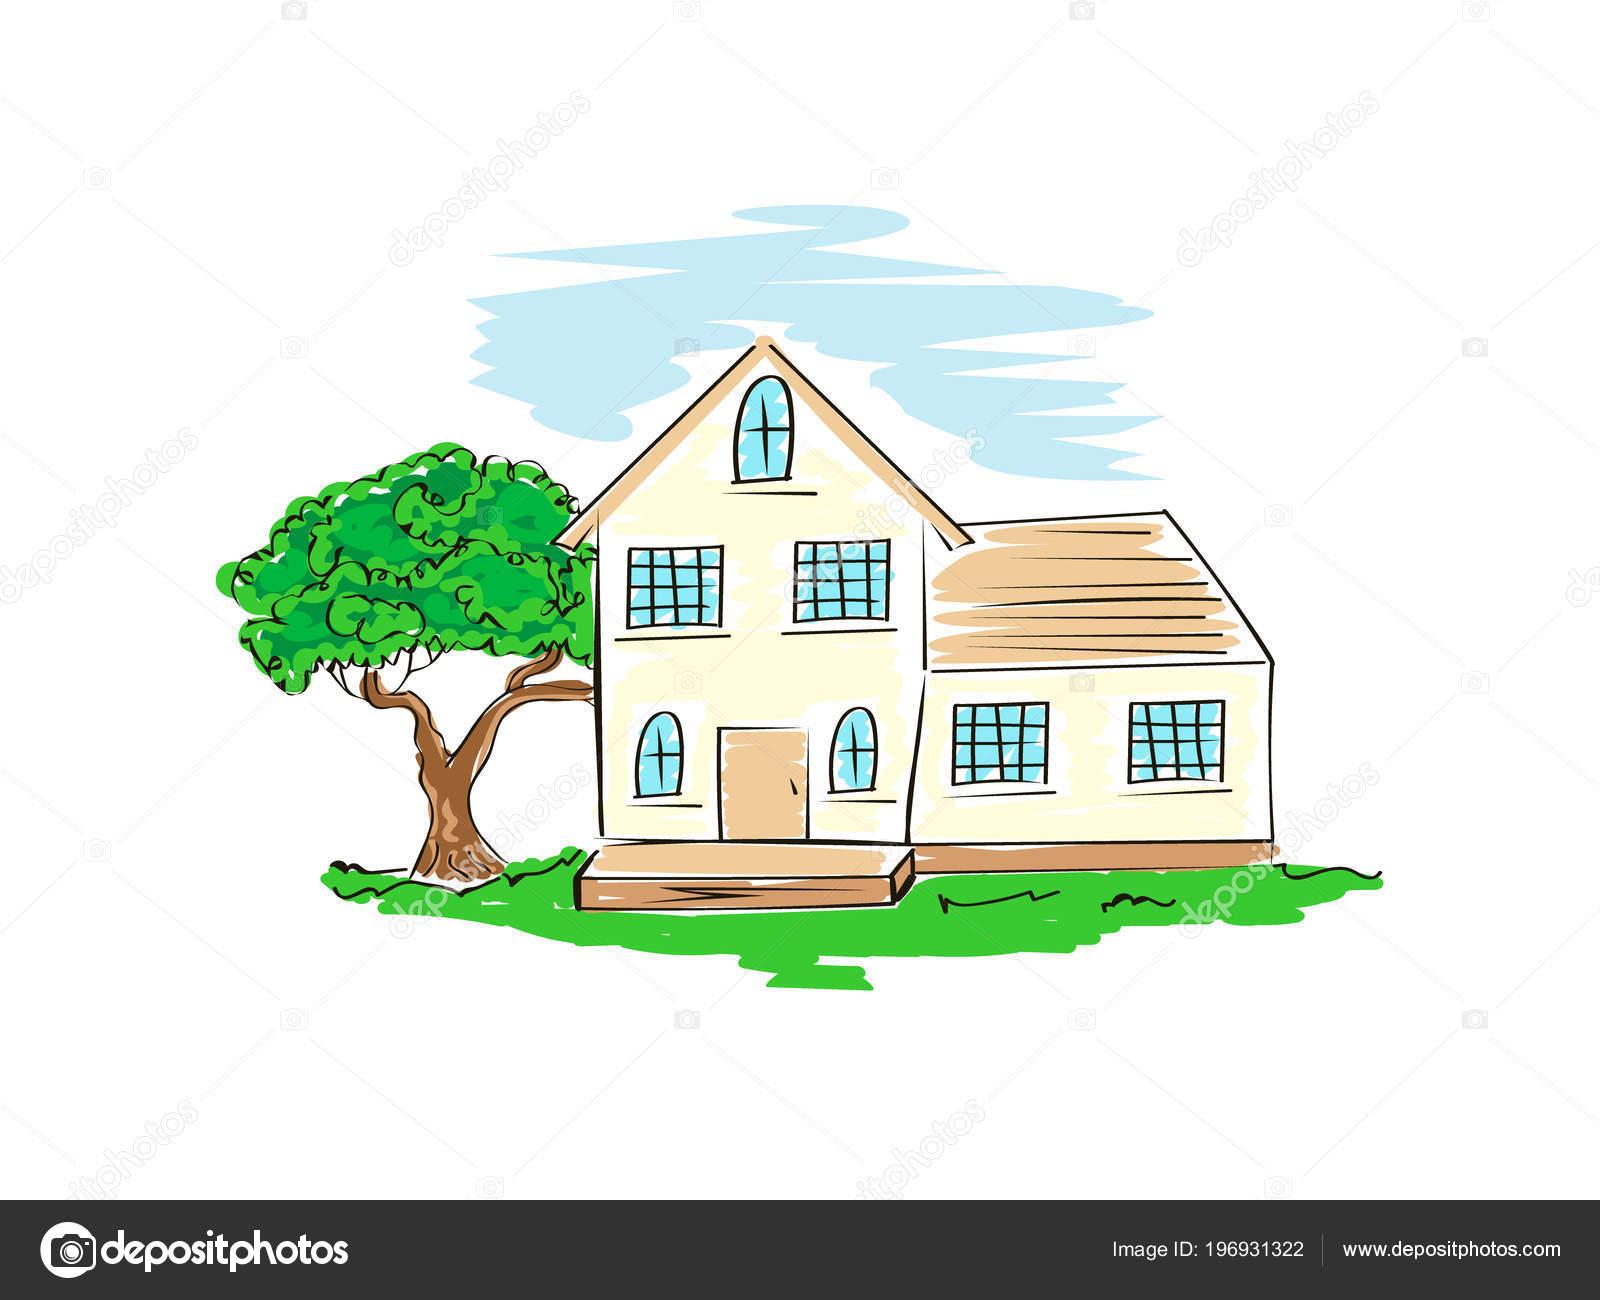 Dessin Libre croquis vector stock maison architecture dessin main libre simple